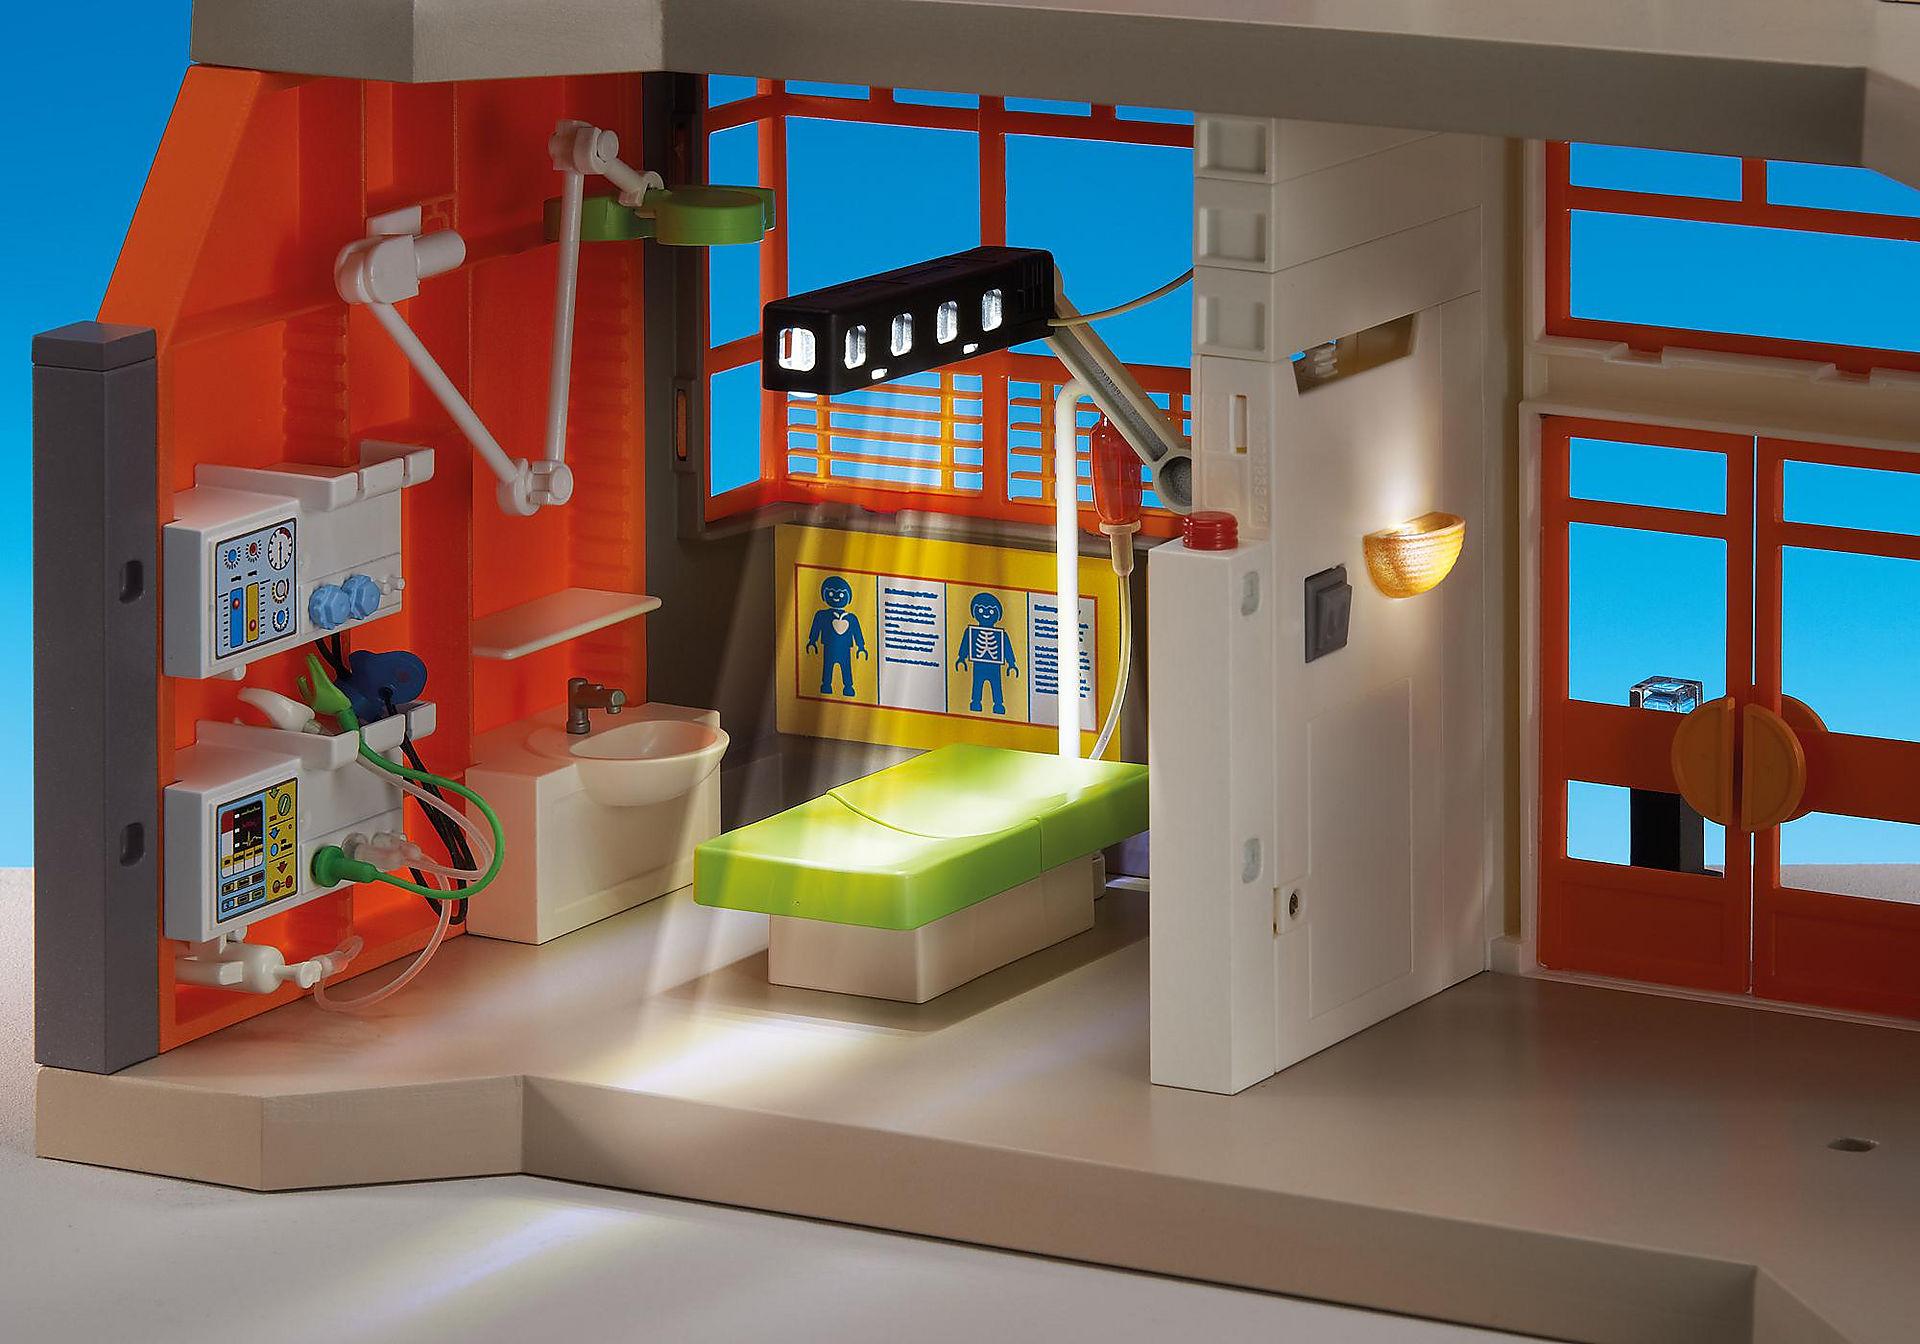 http://media.playmobil.com/i/playmobil/6446_product_extra1/Beleuchtungsset Kinderklinik